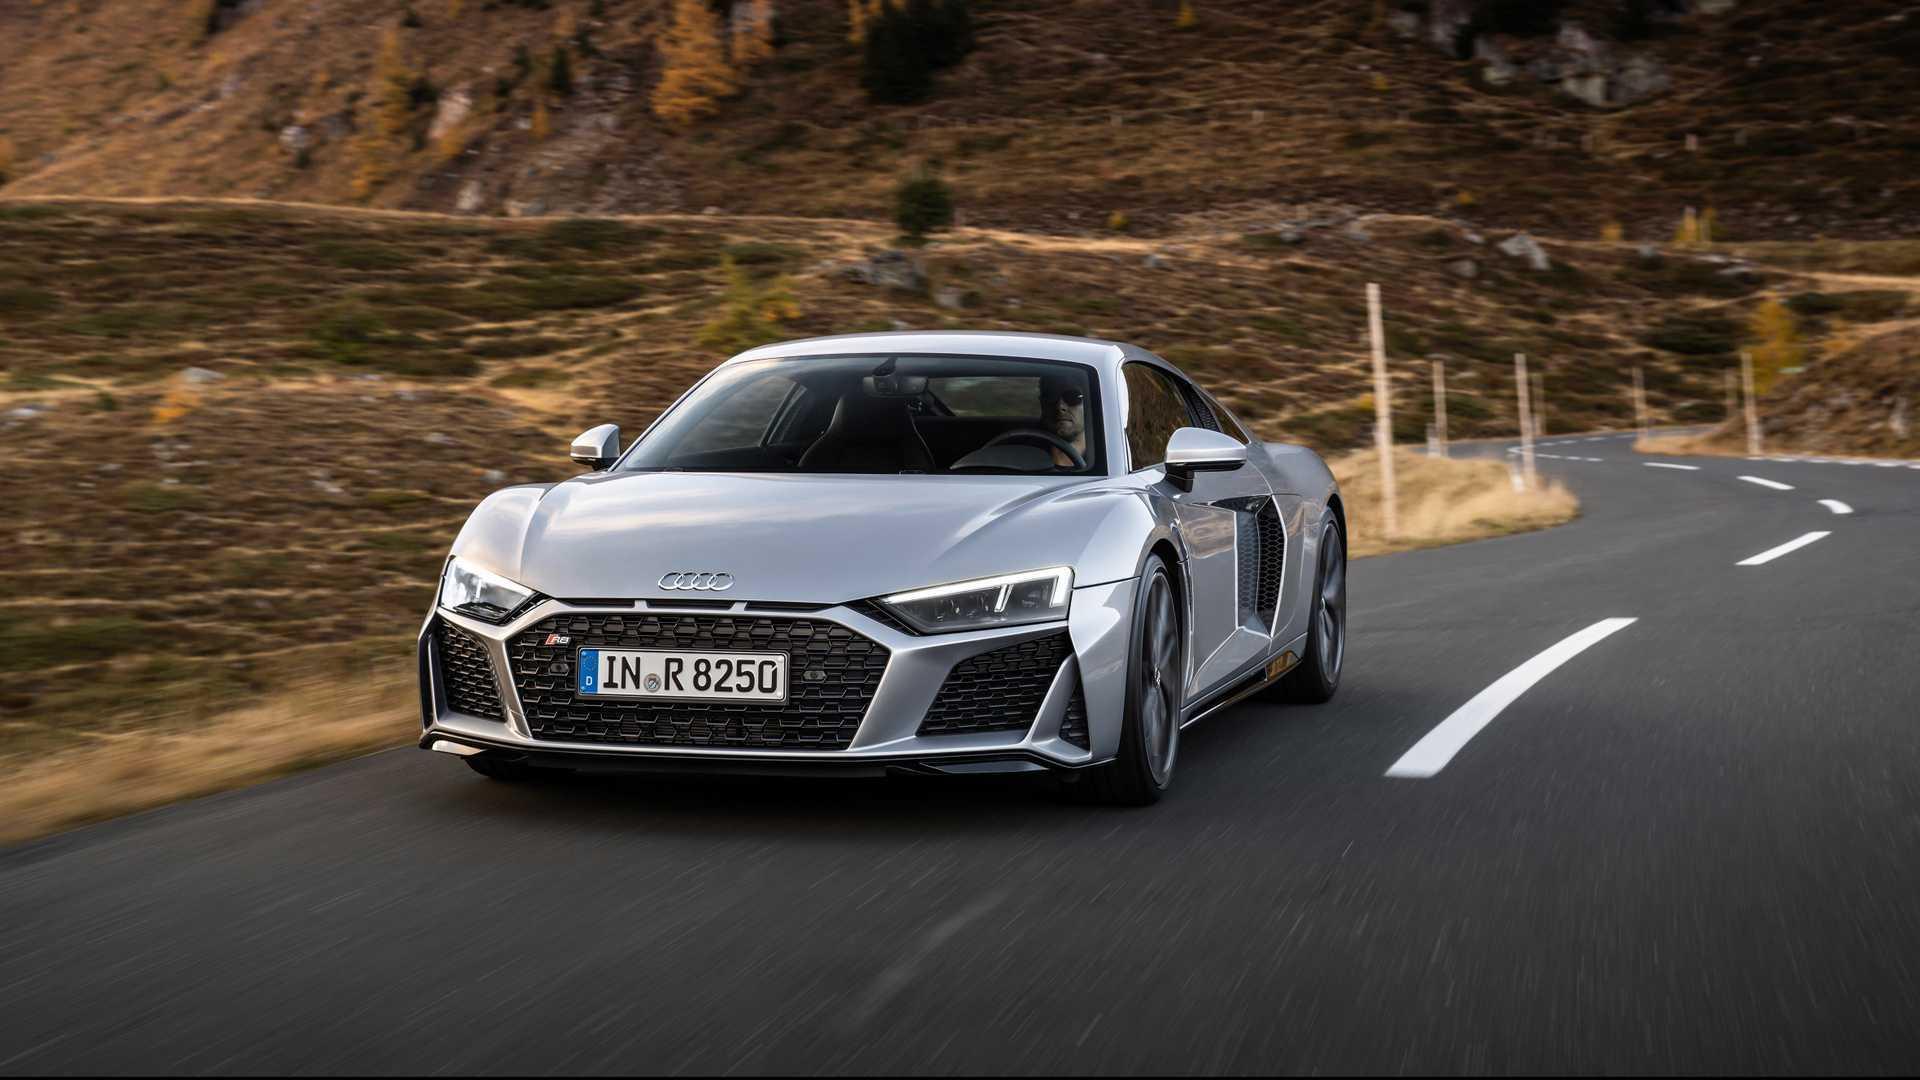 Audi R8 V10 Rwd 2020 Propulsion Trasera Y 540 Cv